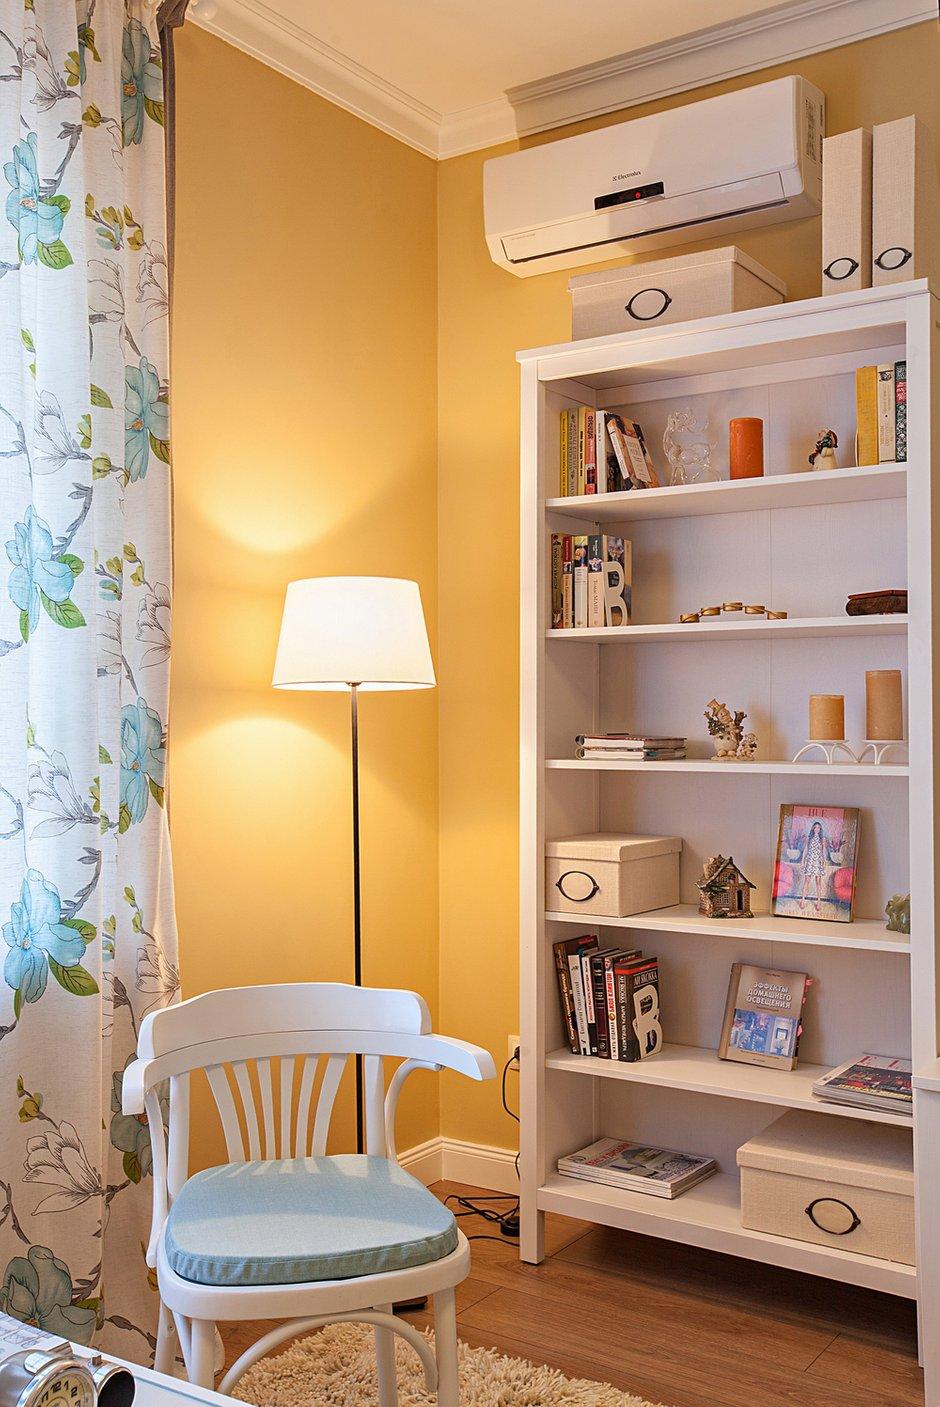 Фотография: Мебель и свет в стиле Прованс и Кантри, Квартира, Дома и квартиры – фото на INMYROOM